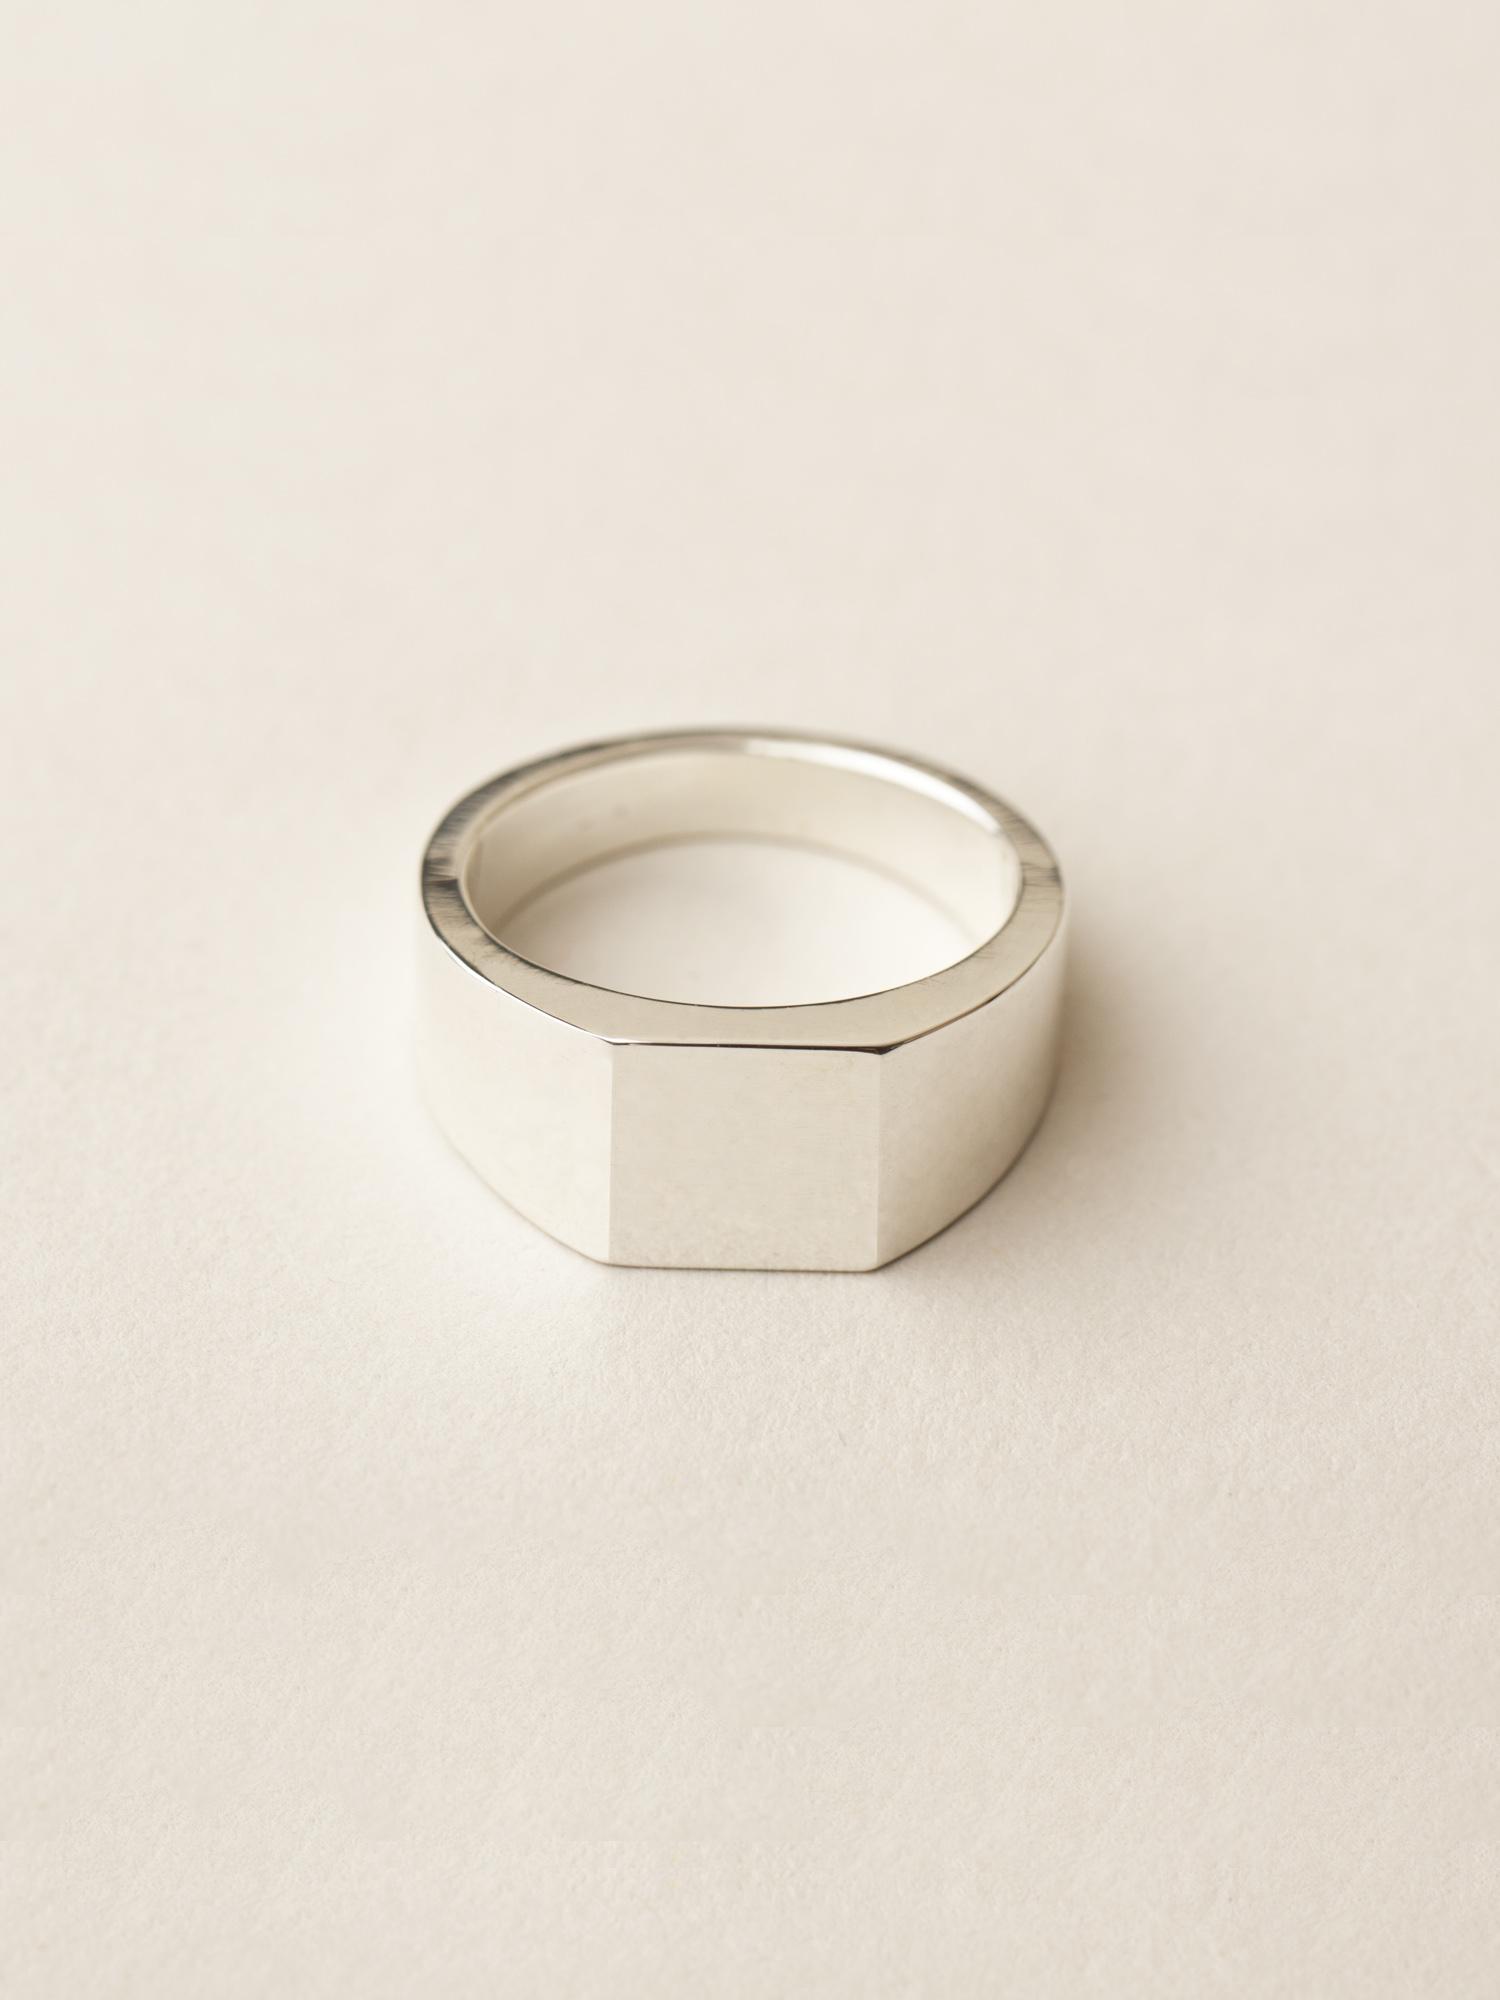 Siegelring Minima, groß quadratisch in 925 Silber Signet ring Minima, big square in sterling silver